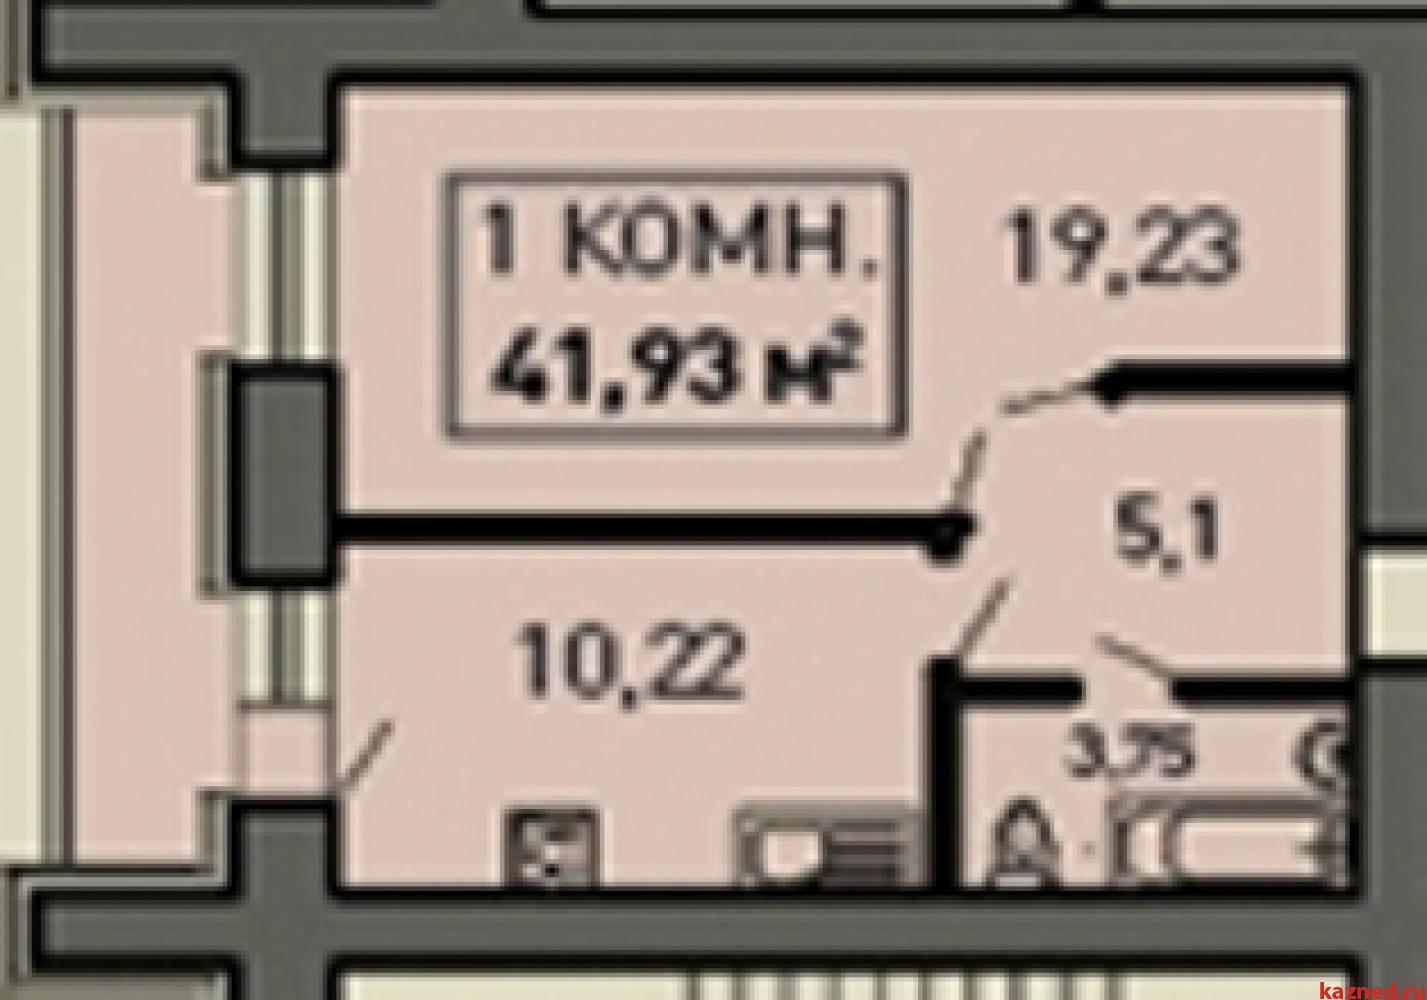 Продажа 1-к квартиры Лукина, д.52, 41 м² (миниатюра №3)